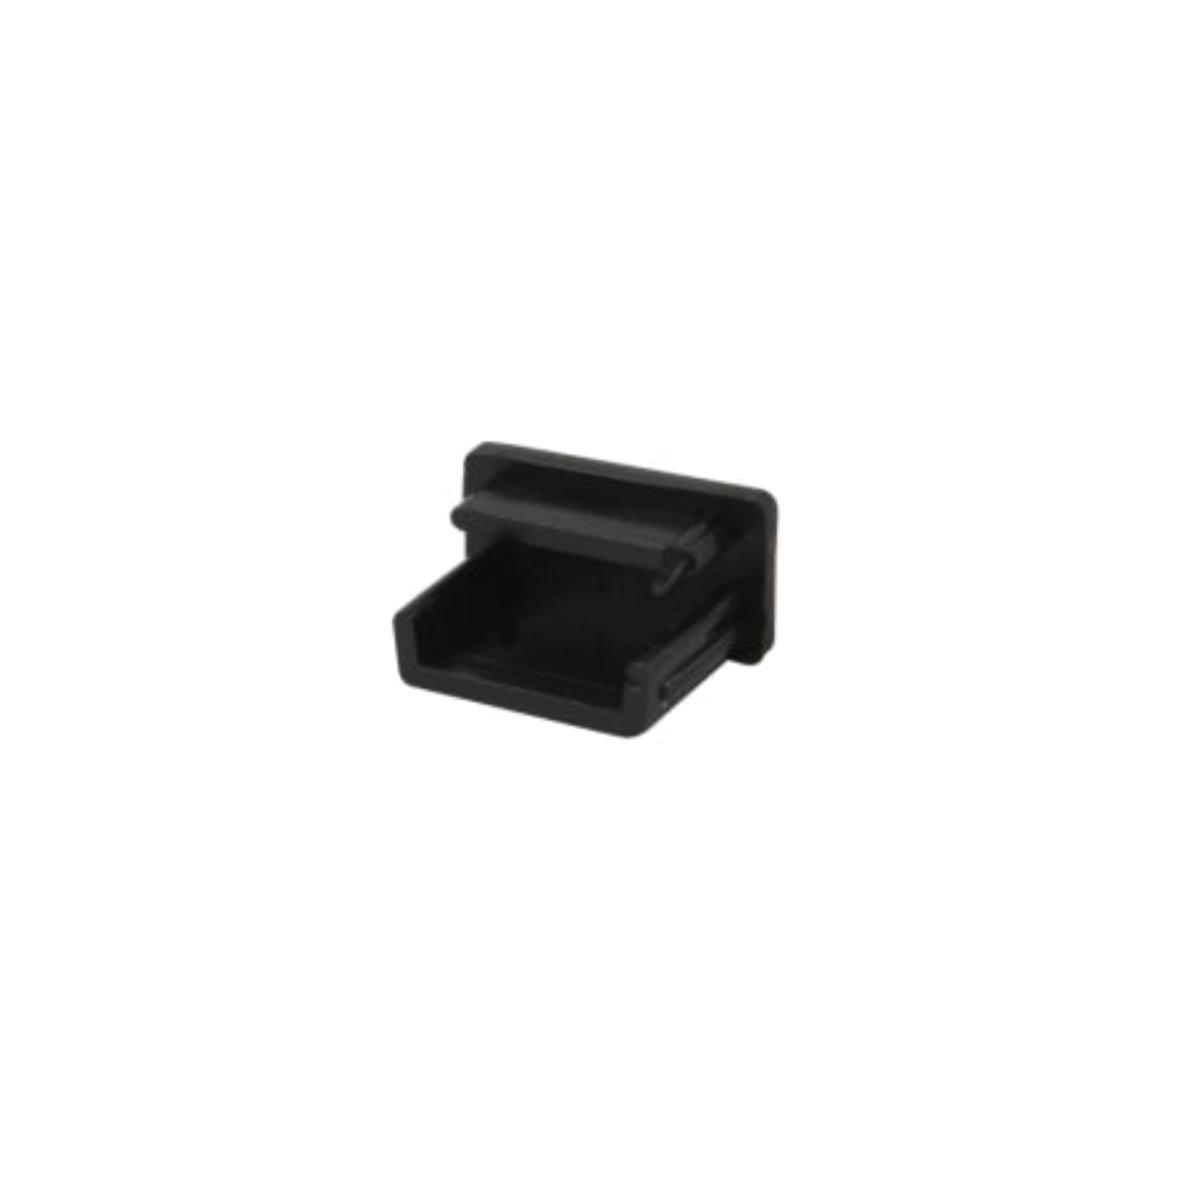 Aluprofil eloxiert black white f r led lichtband for Design artikel shop